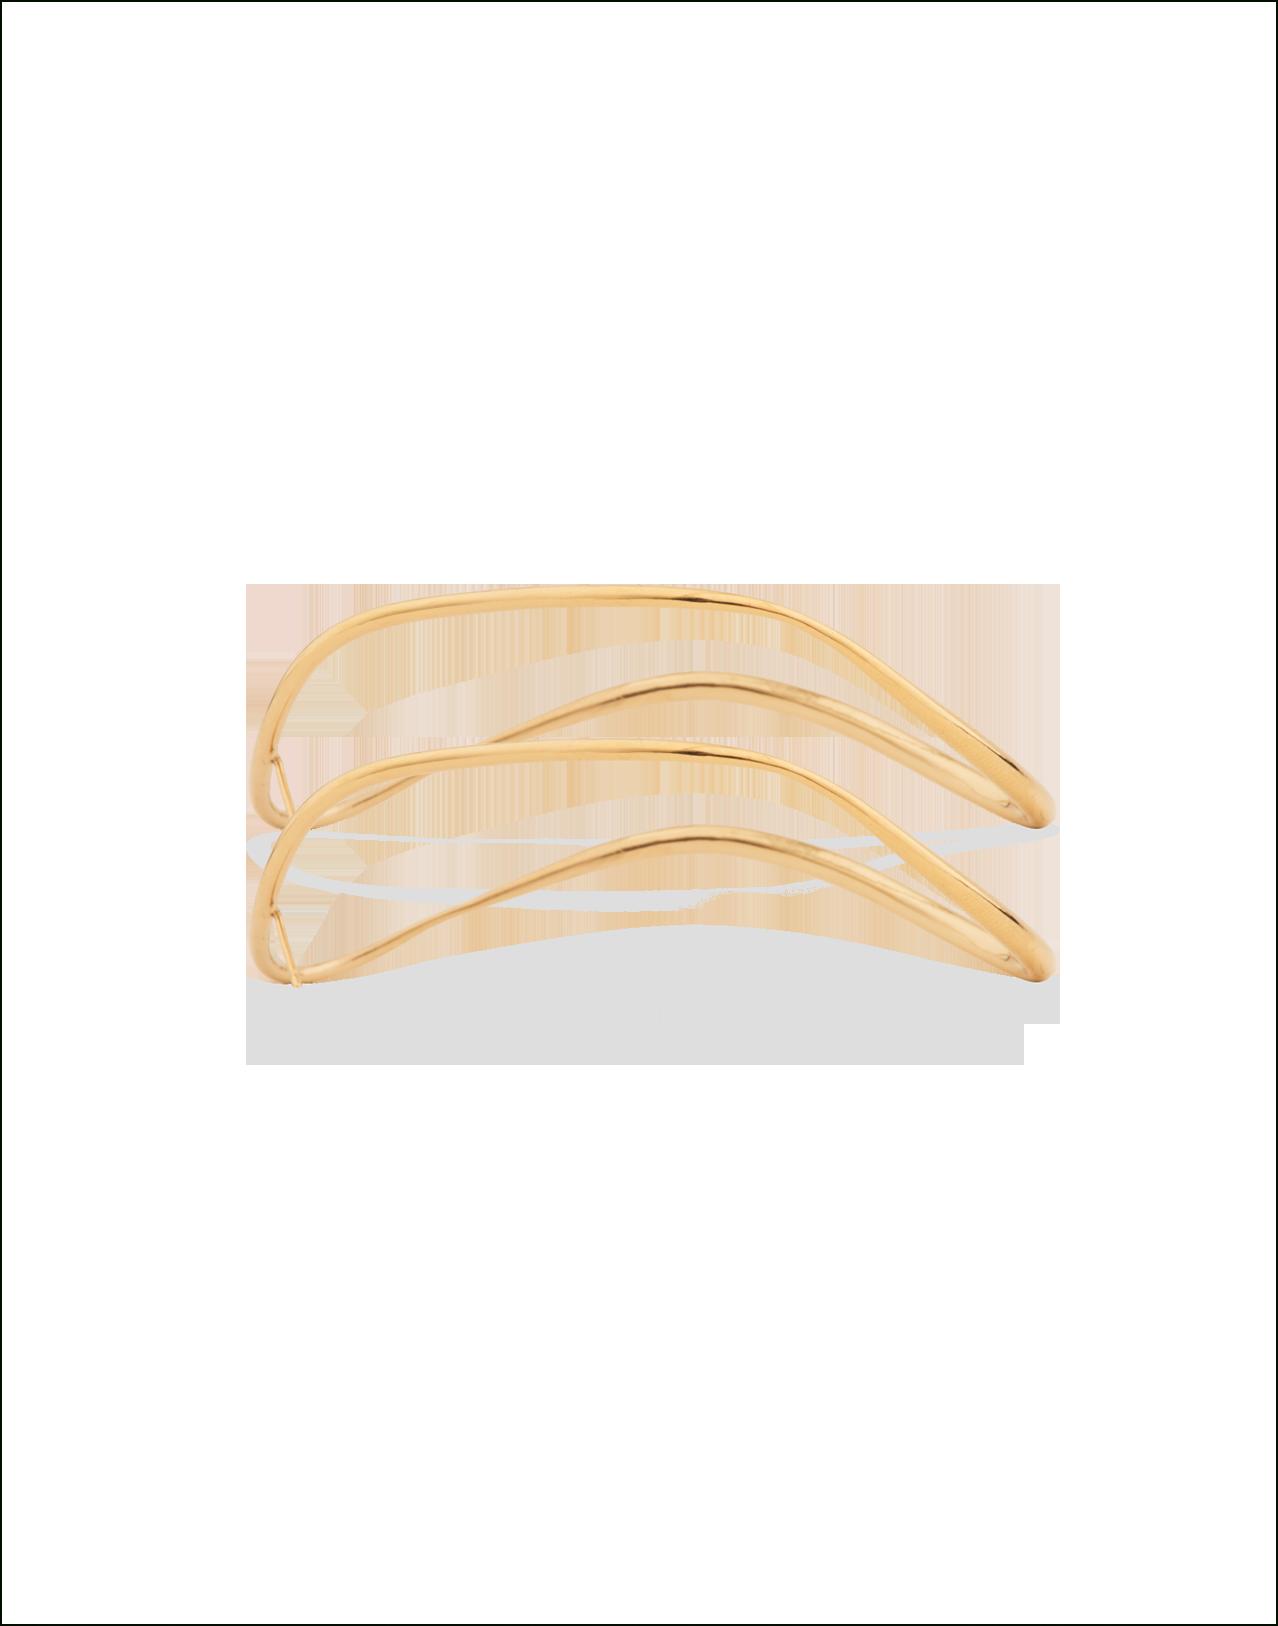 Completedworks-Earrings-Gold-Vermeil-Subcommittees-3-1.png